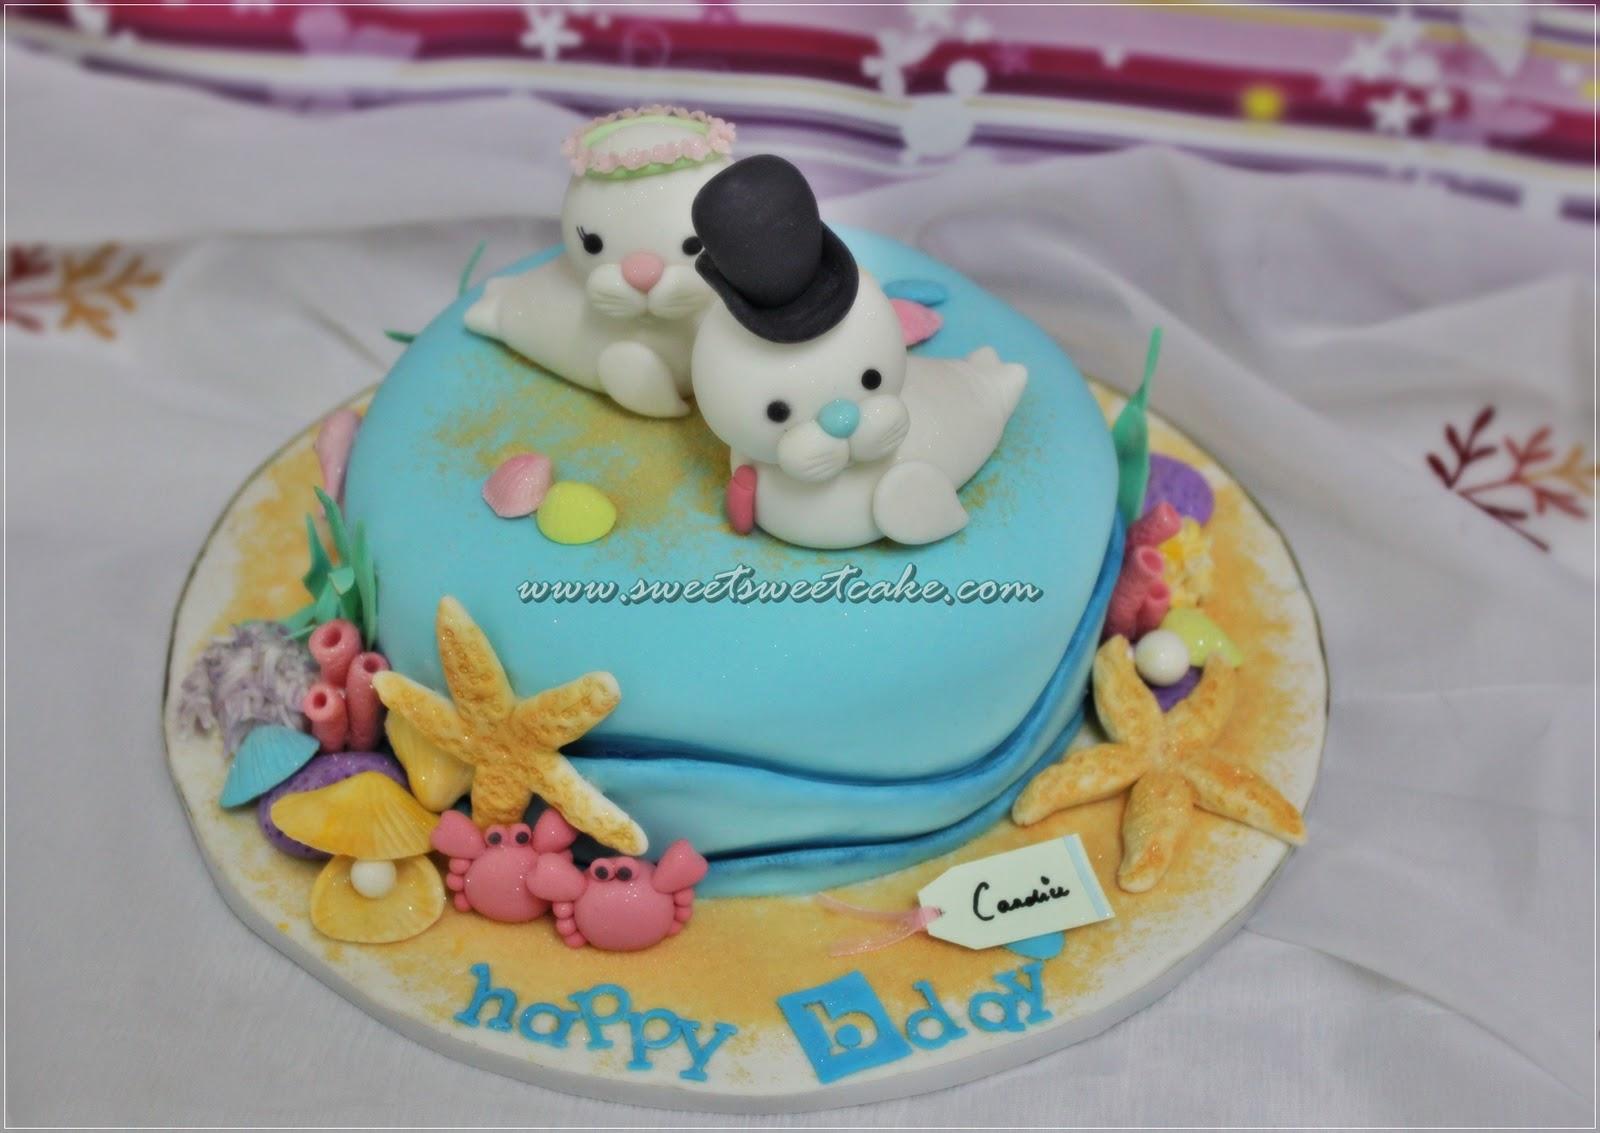 Candis Cakes Pei